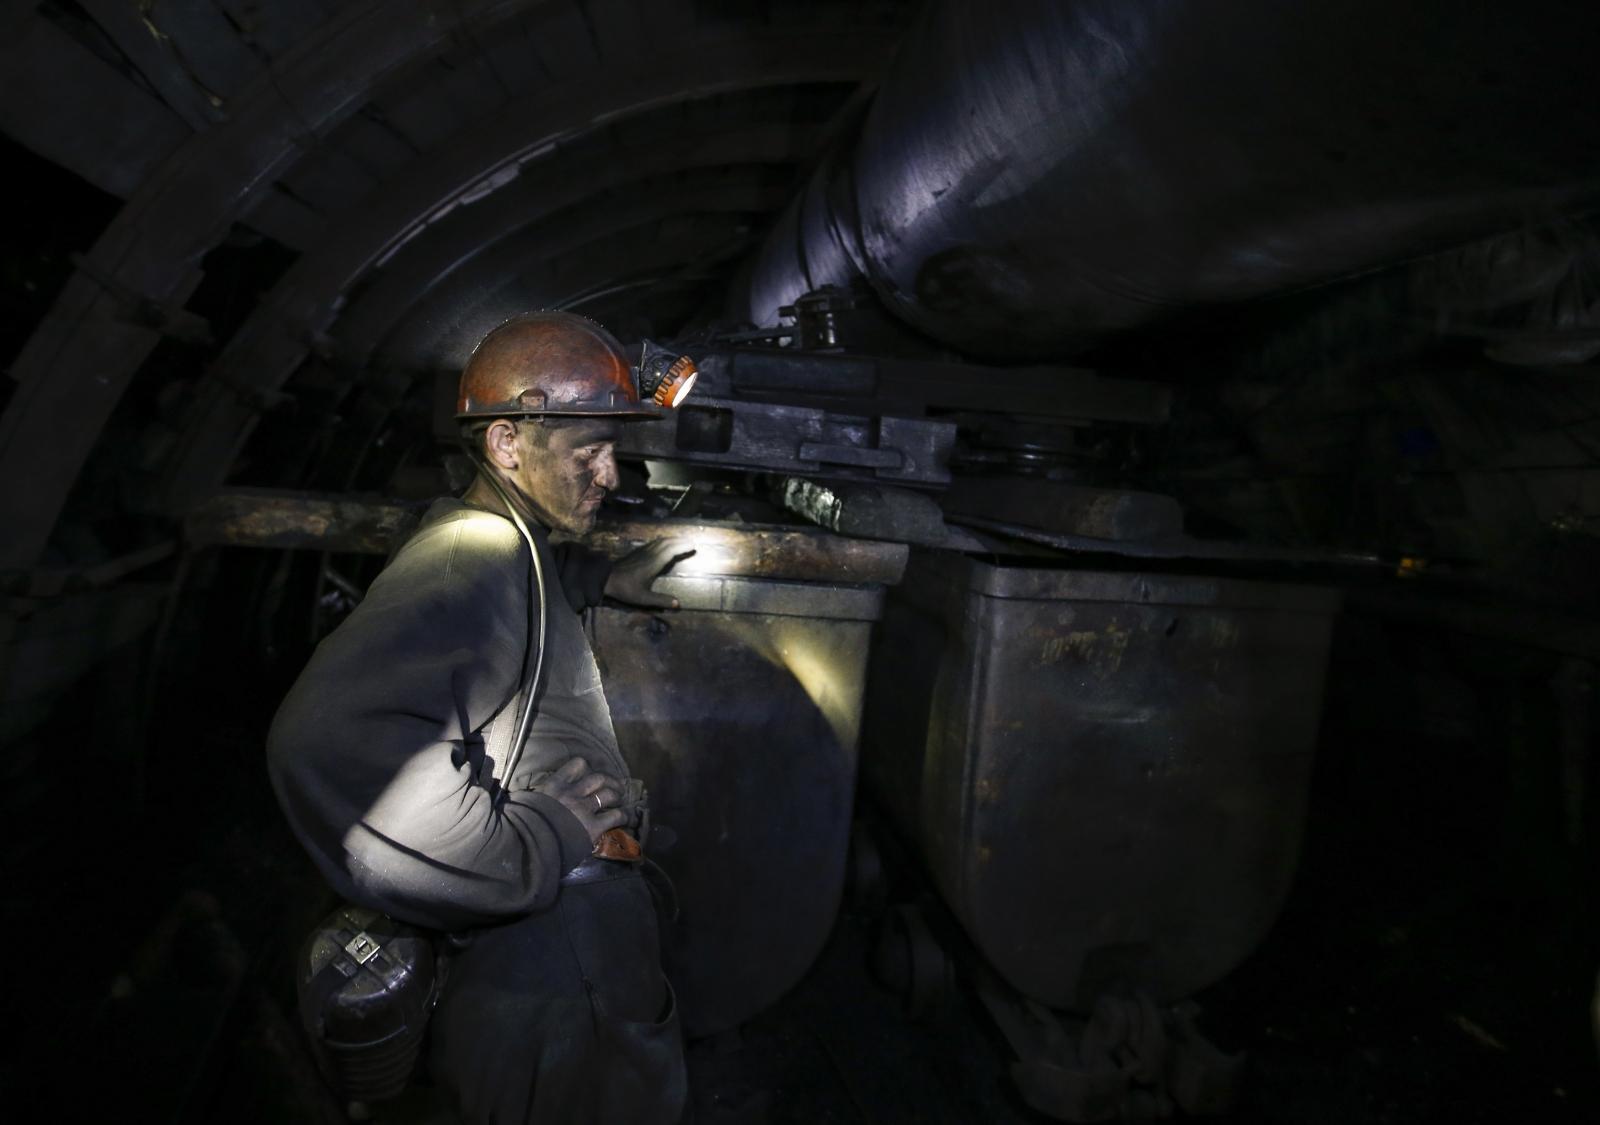 Ukraine mine blast